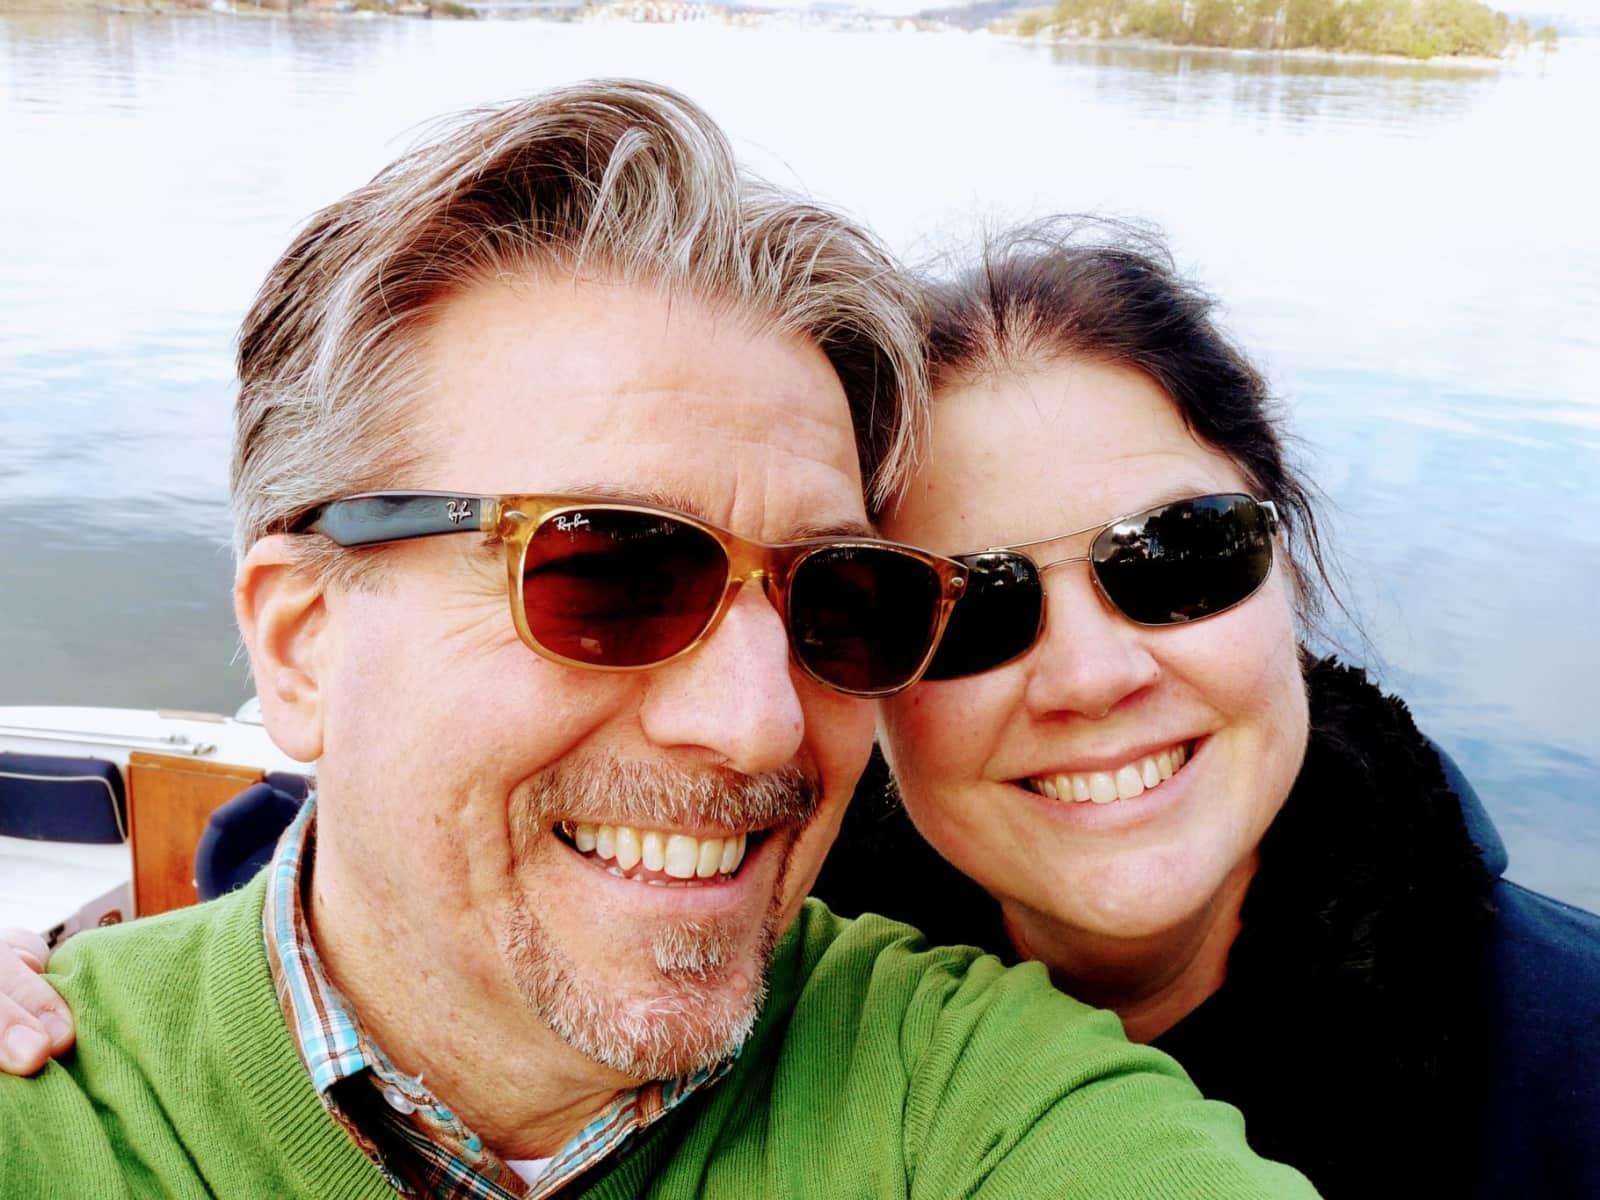 Aaron & Kimberly from Stavanger, Norway